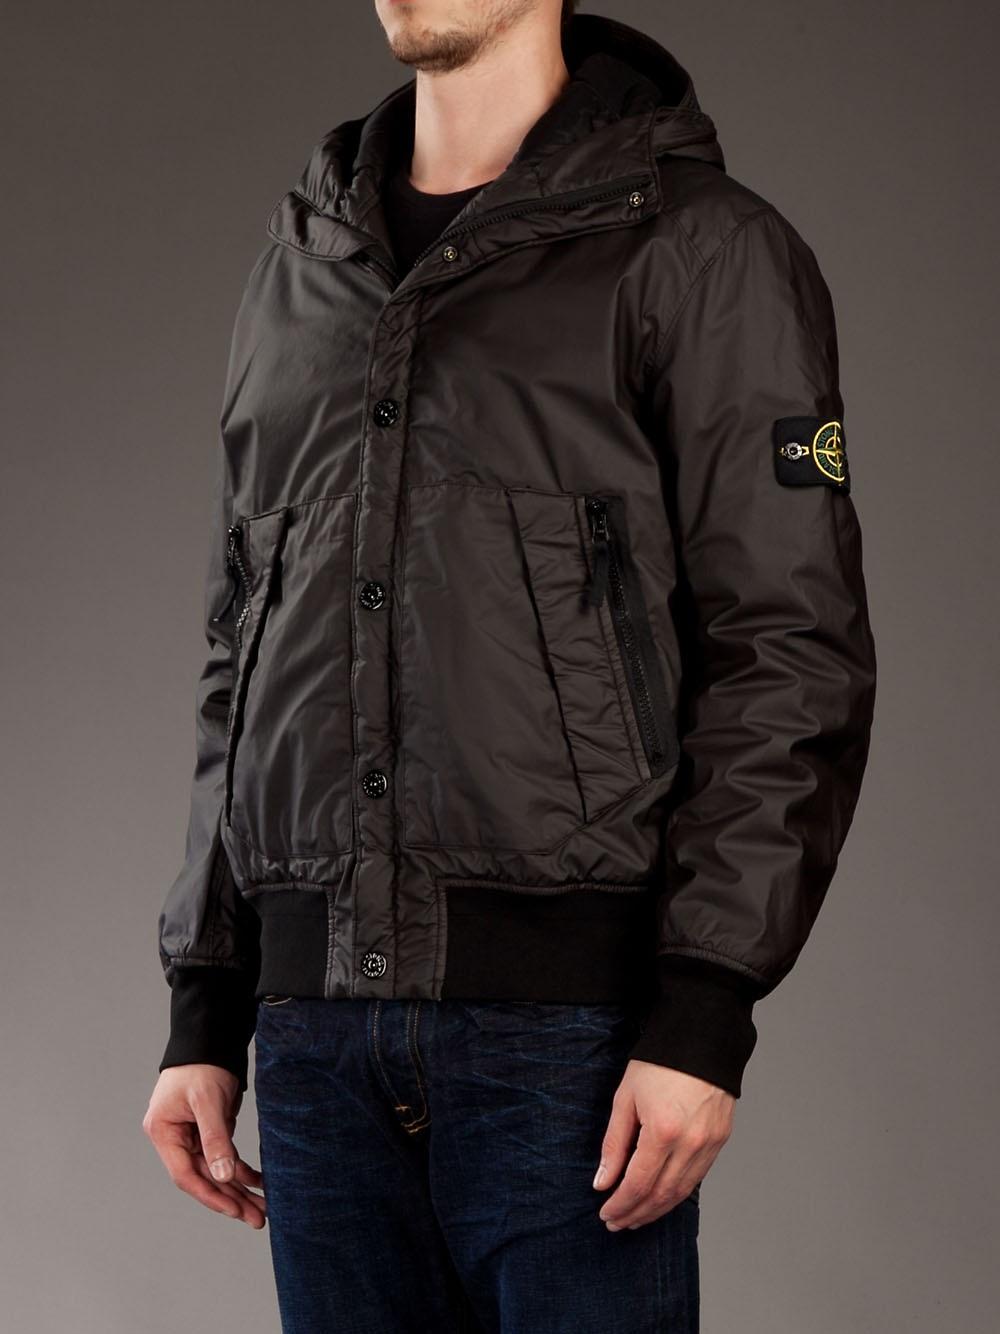 9148e9ddc Stone Island Black Bomber Jacket for men